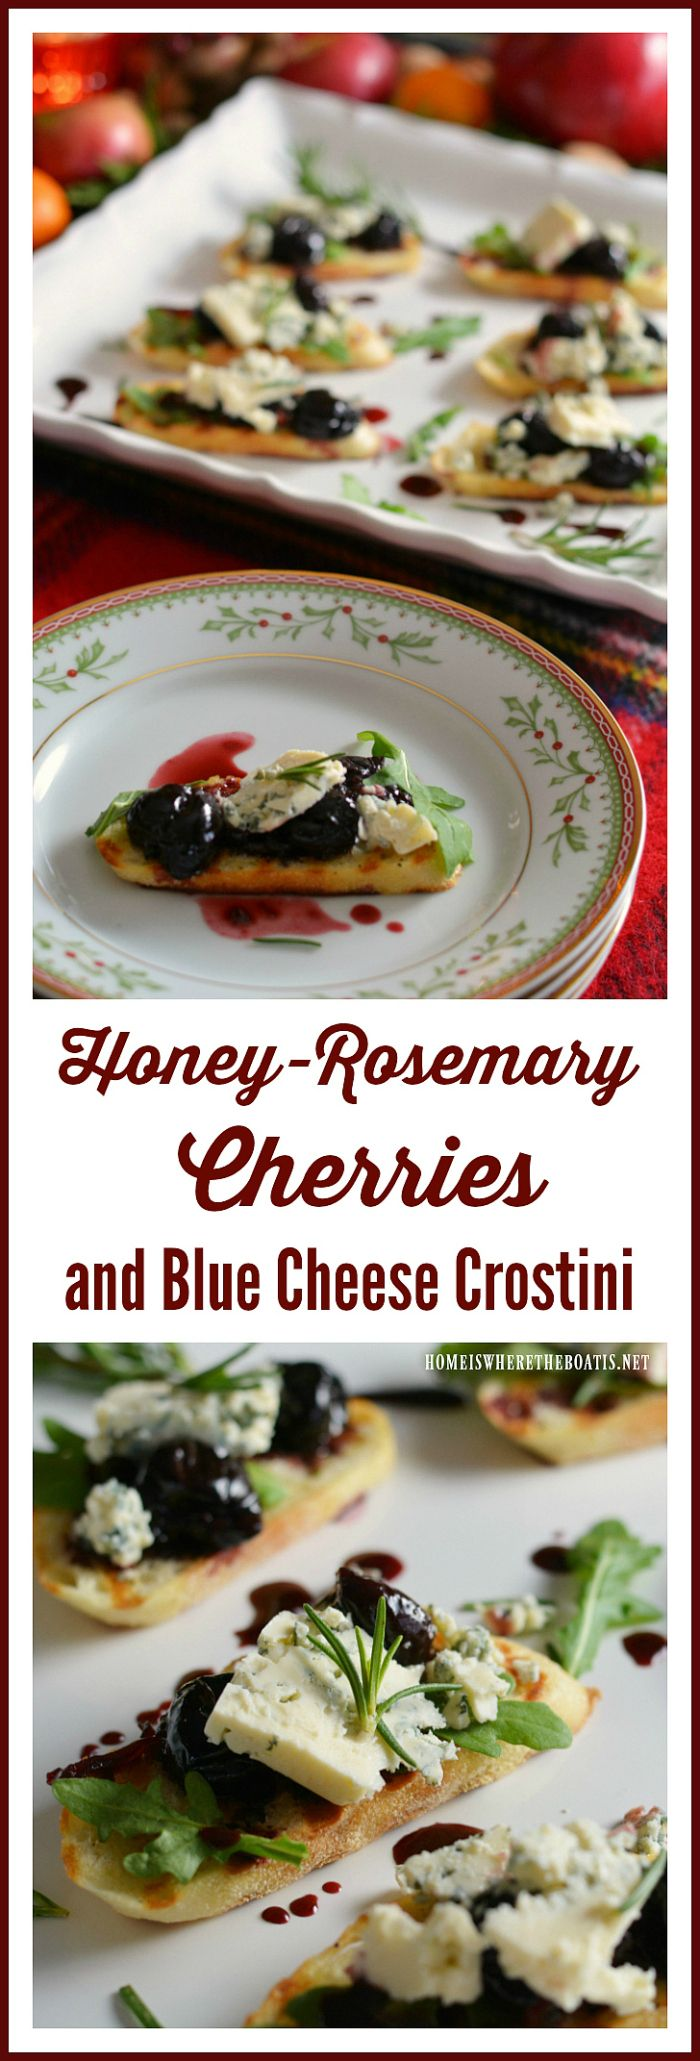 Honey-Rosemary Cherries and Blue Cheese Crostini!   homeiswheretheboatis.net #appetizer